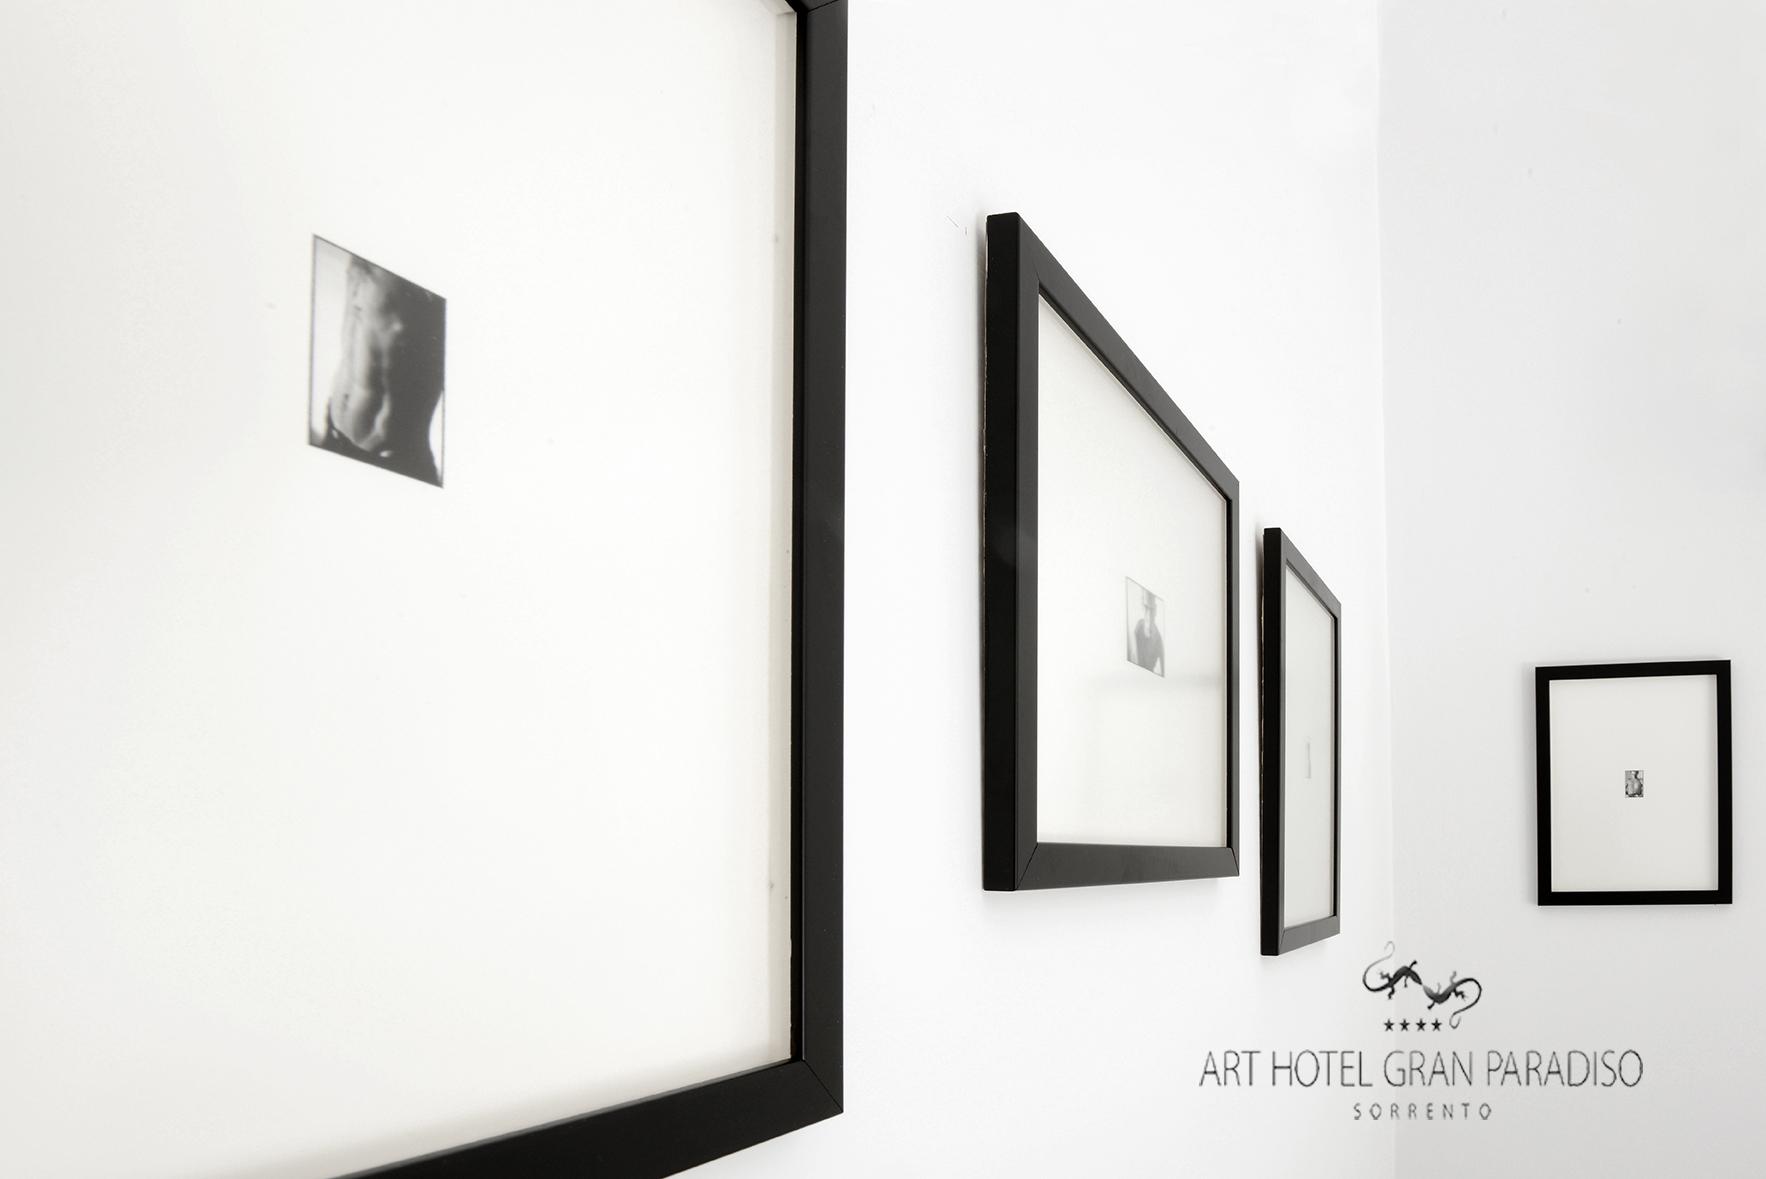 Art_Hotel_Gran_Paradiso_2013_412_Luca_Massimo_Barbero_3.jpg